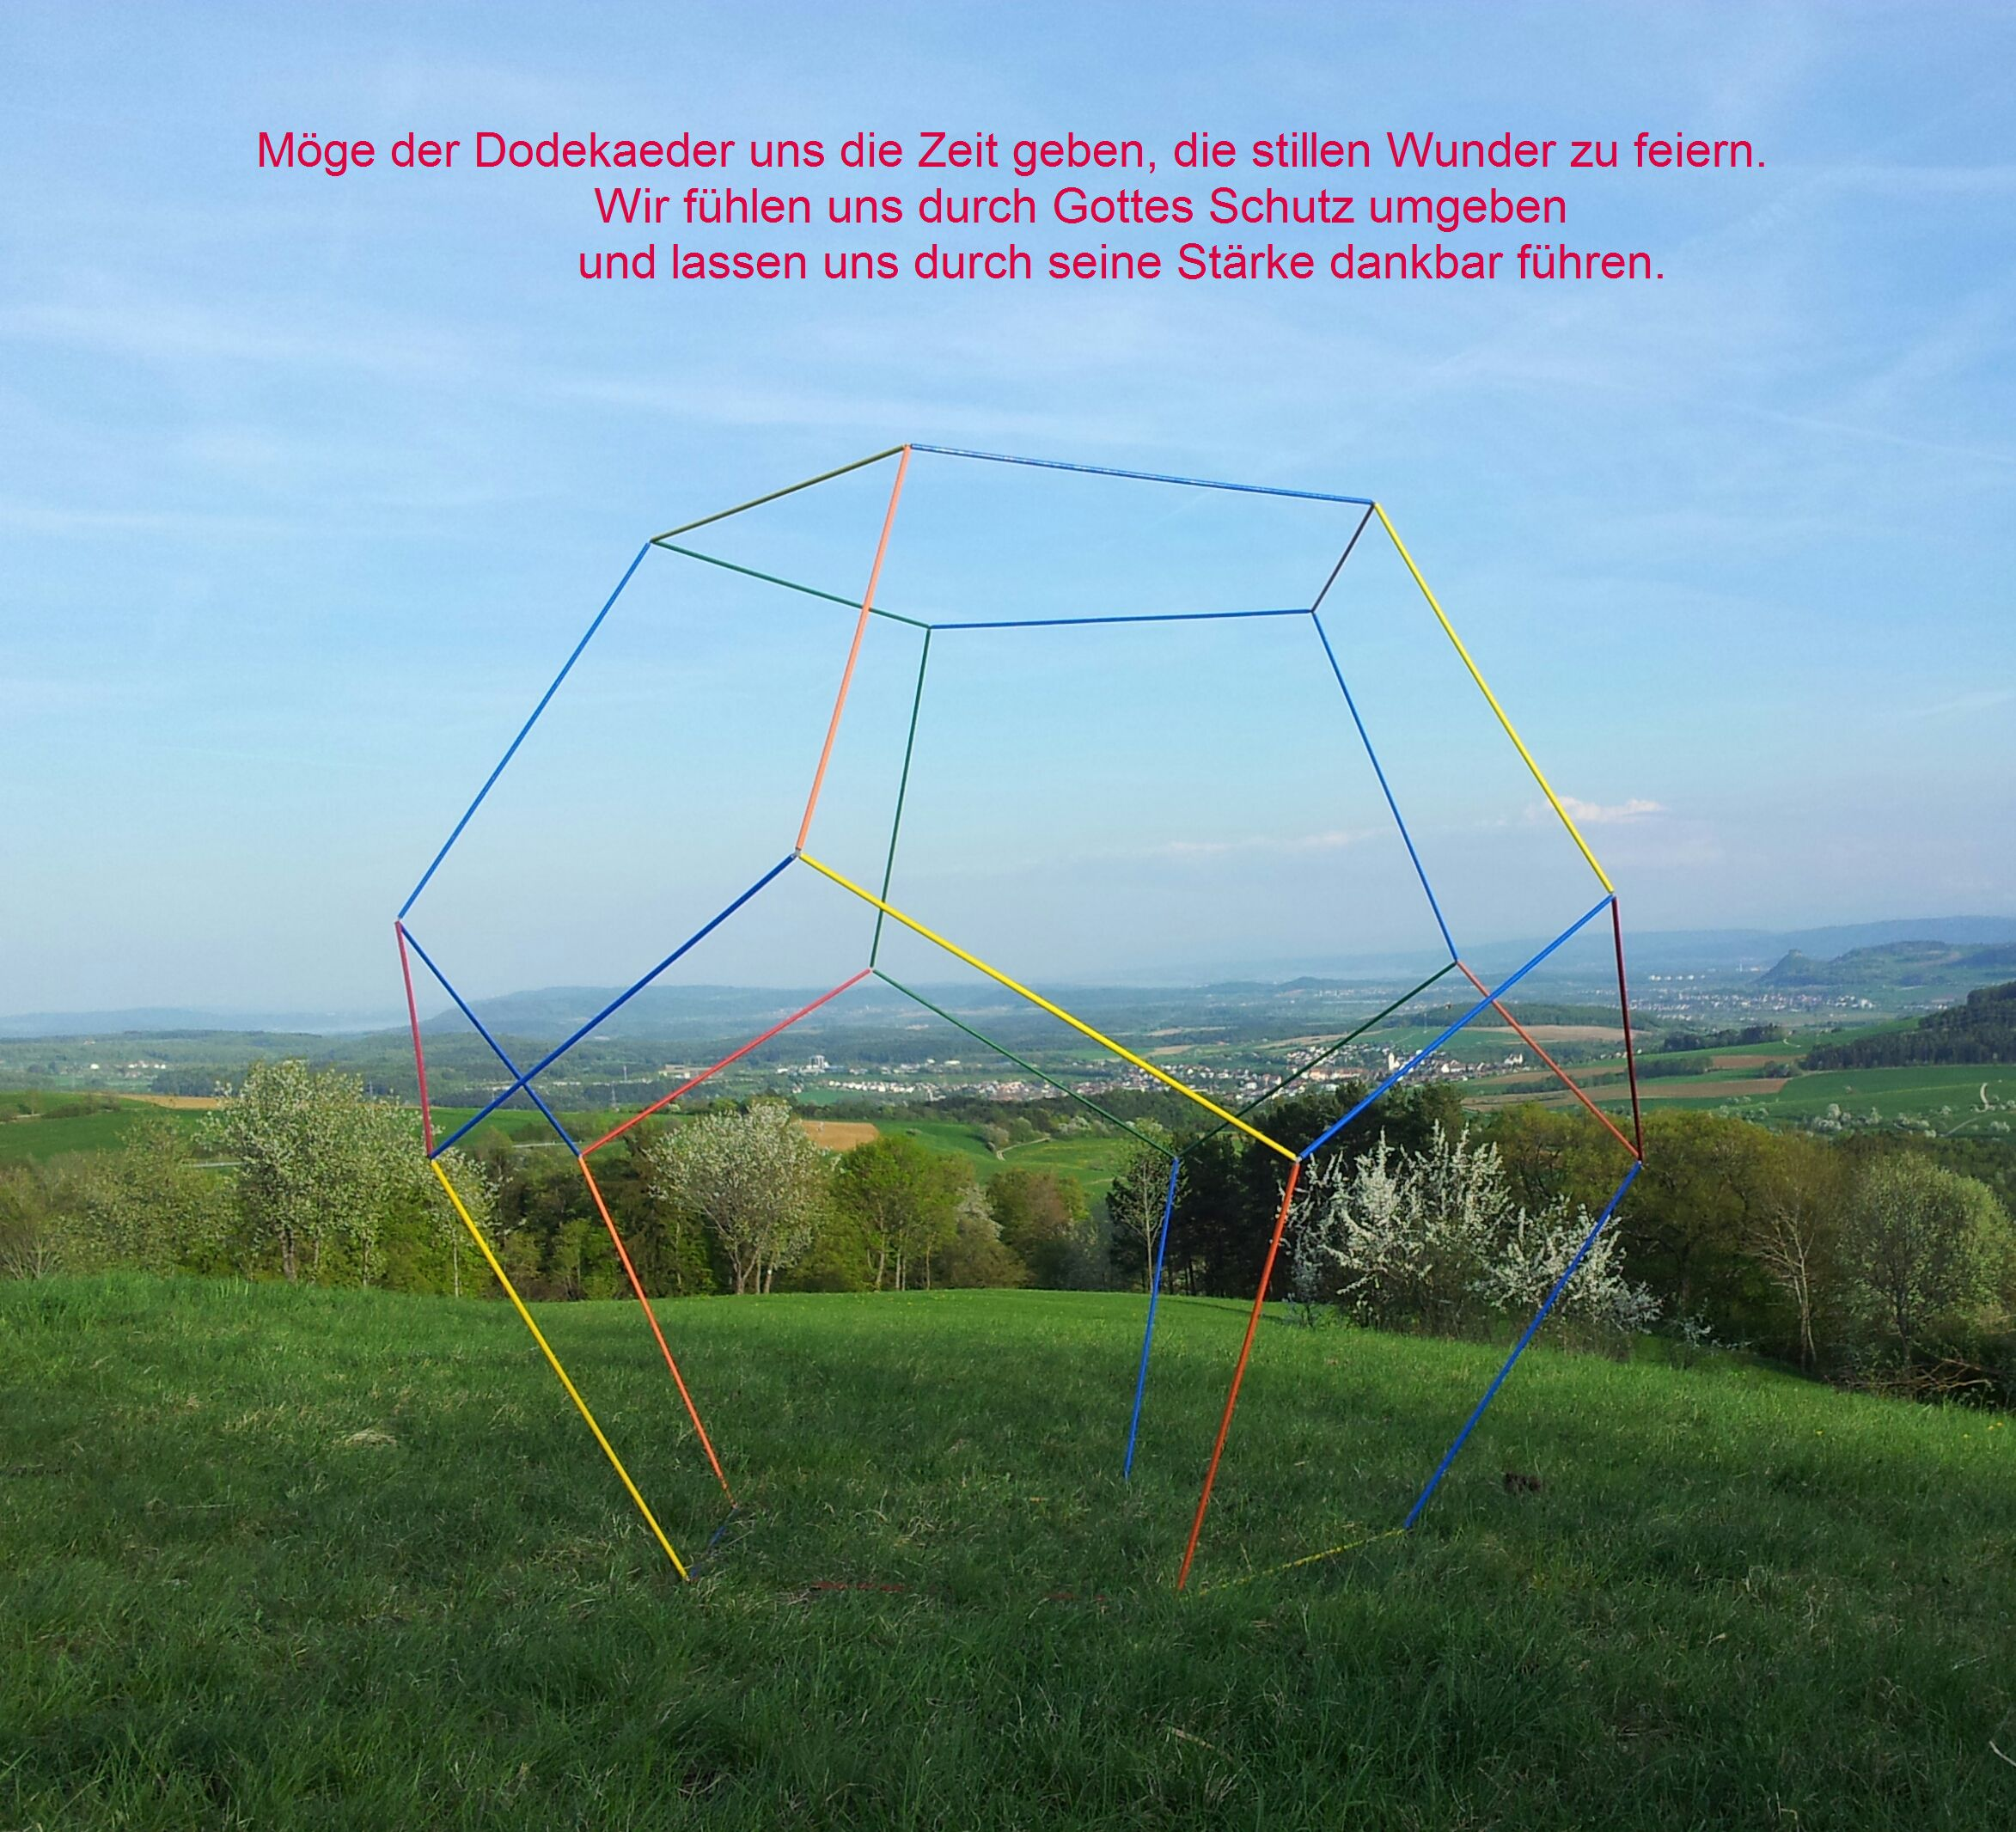 www.owaye.com begehbarer Pentagondodekaeder Dodekaeder Schmuck usw.